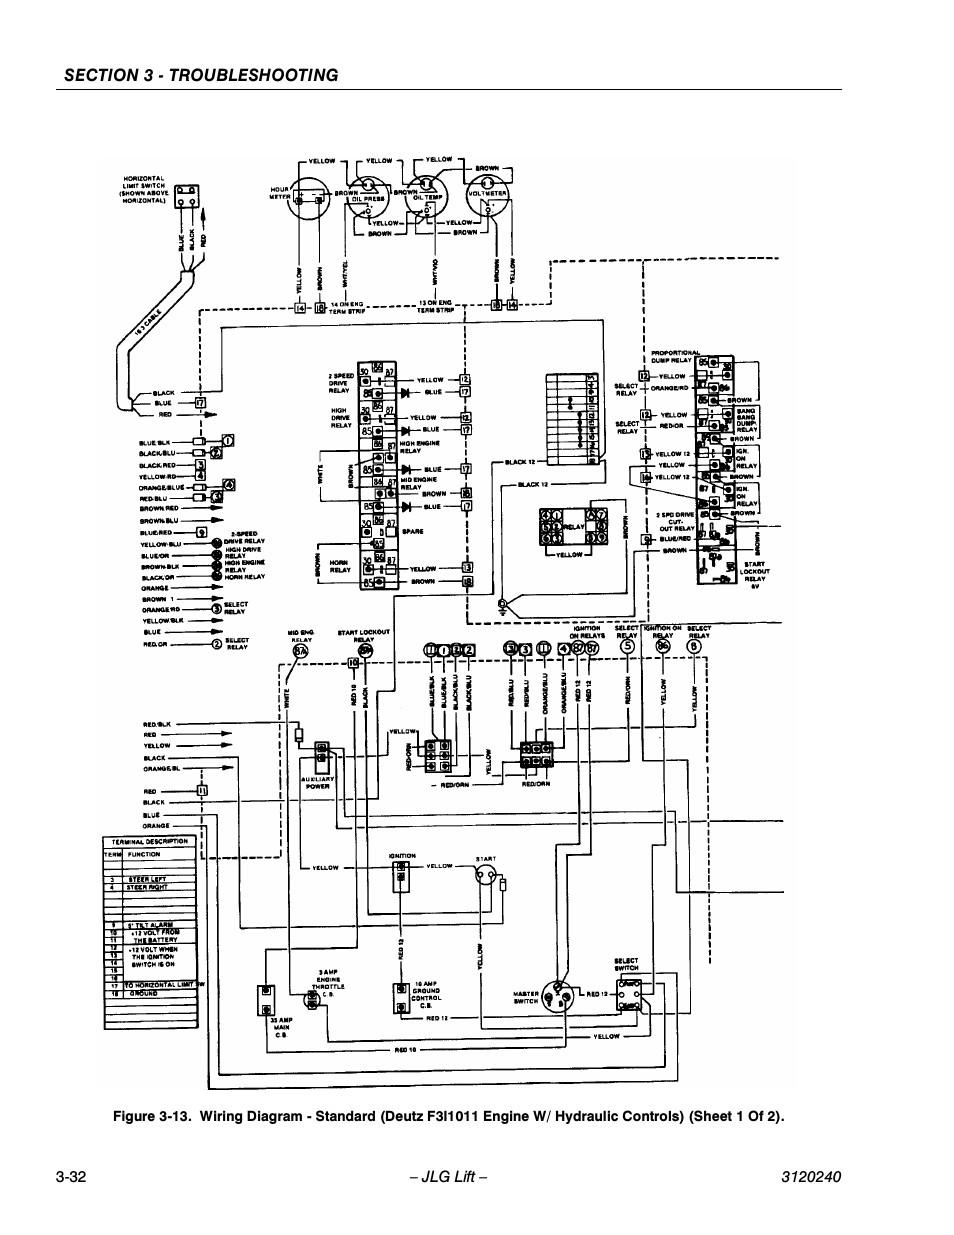 [ANLQ_8698]  Jlg Control Box Wiring Schematics - John Deere 4040 Hvac Wiring Diagram -  corollaa.ikikik.jeanjaures37.fr | John Deere 401cd Wiring Diagram |  | Wiring Diagram